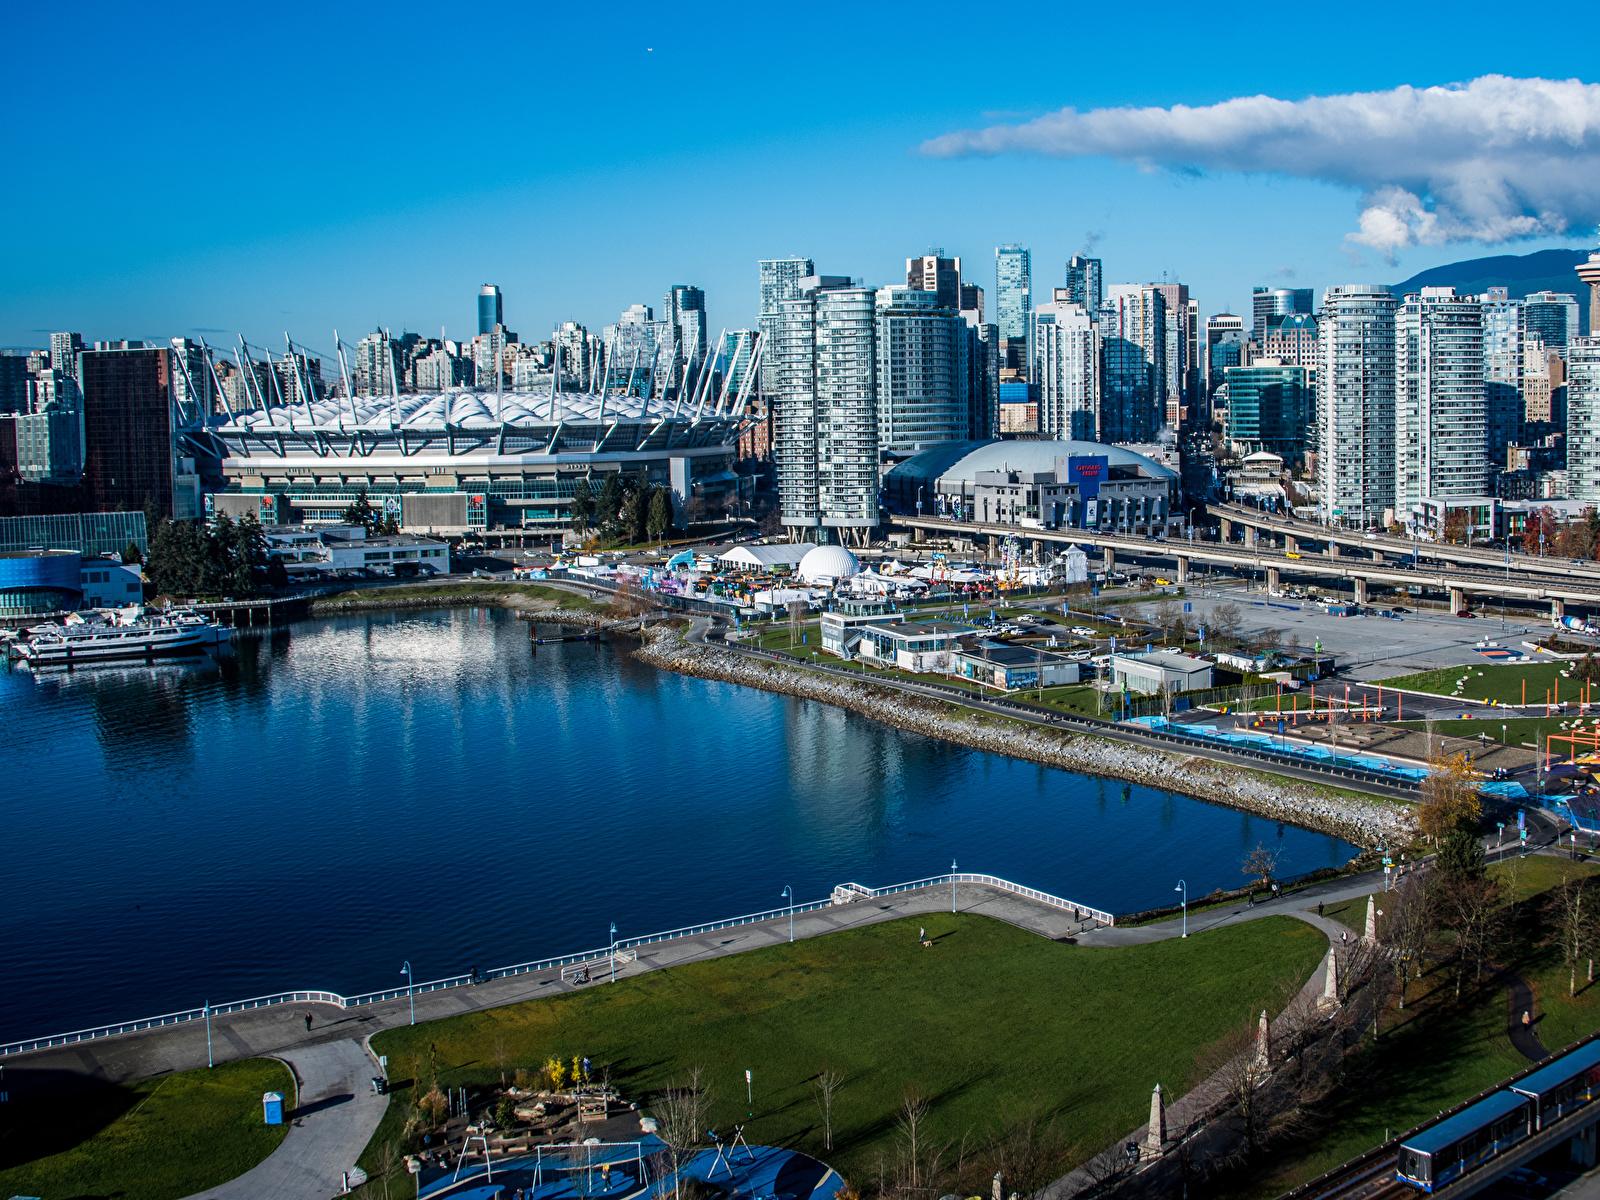 Фото Ванкувер Канада Залив Причалы город Здания 1600x1200 Пирсы залива заливы Пристань Дома Города